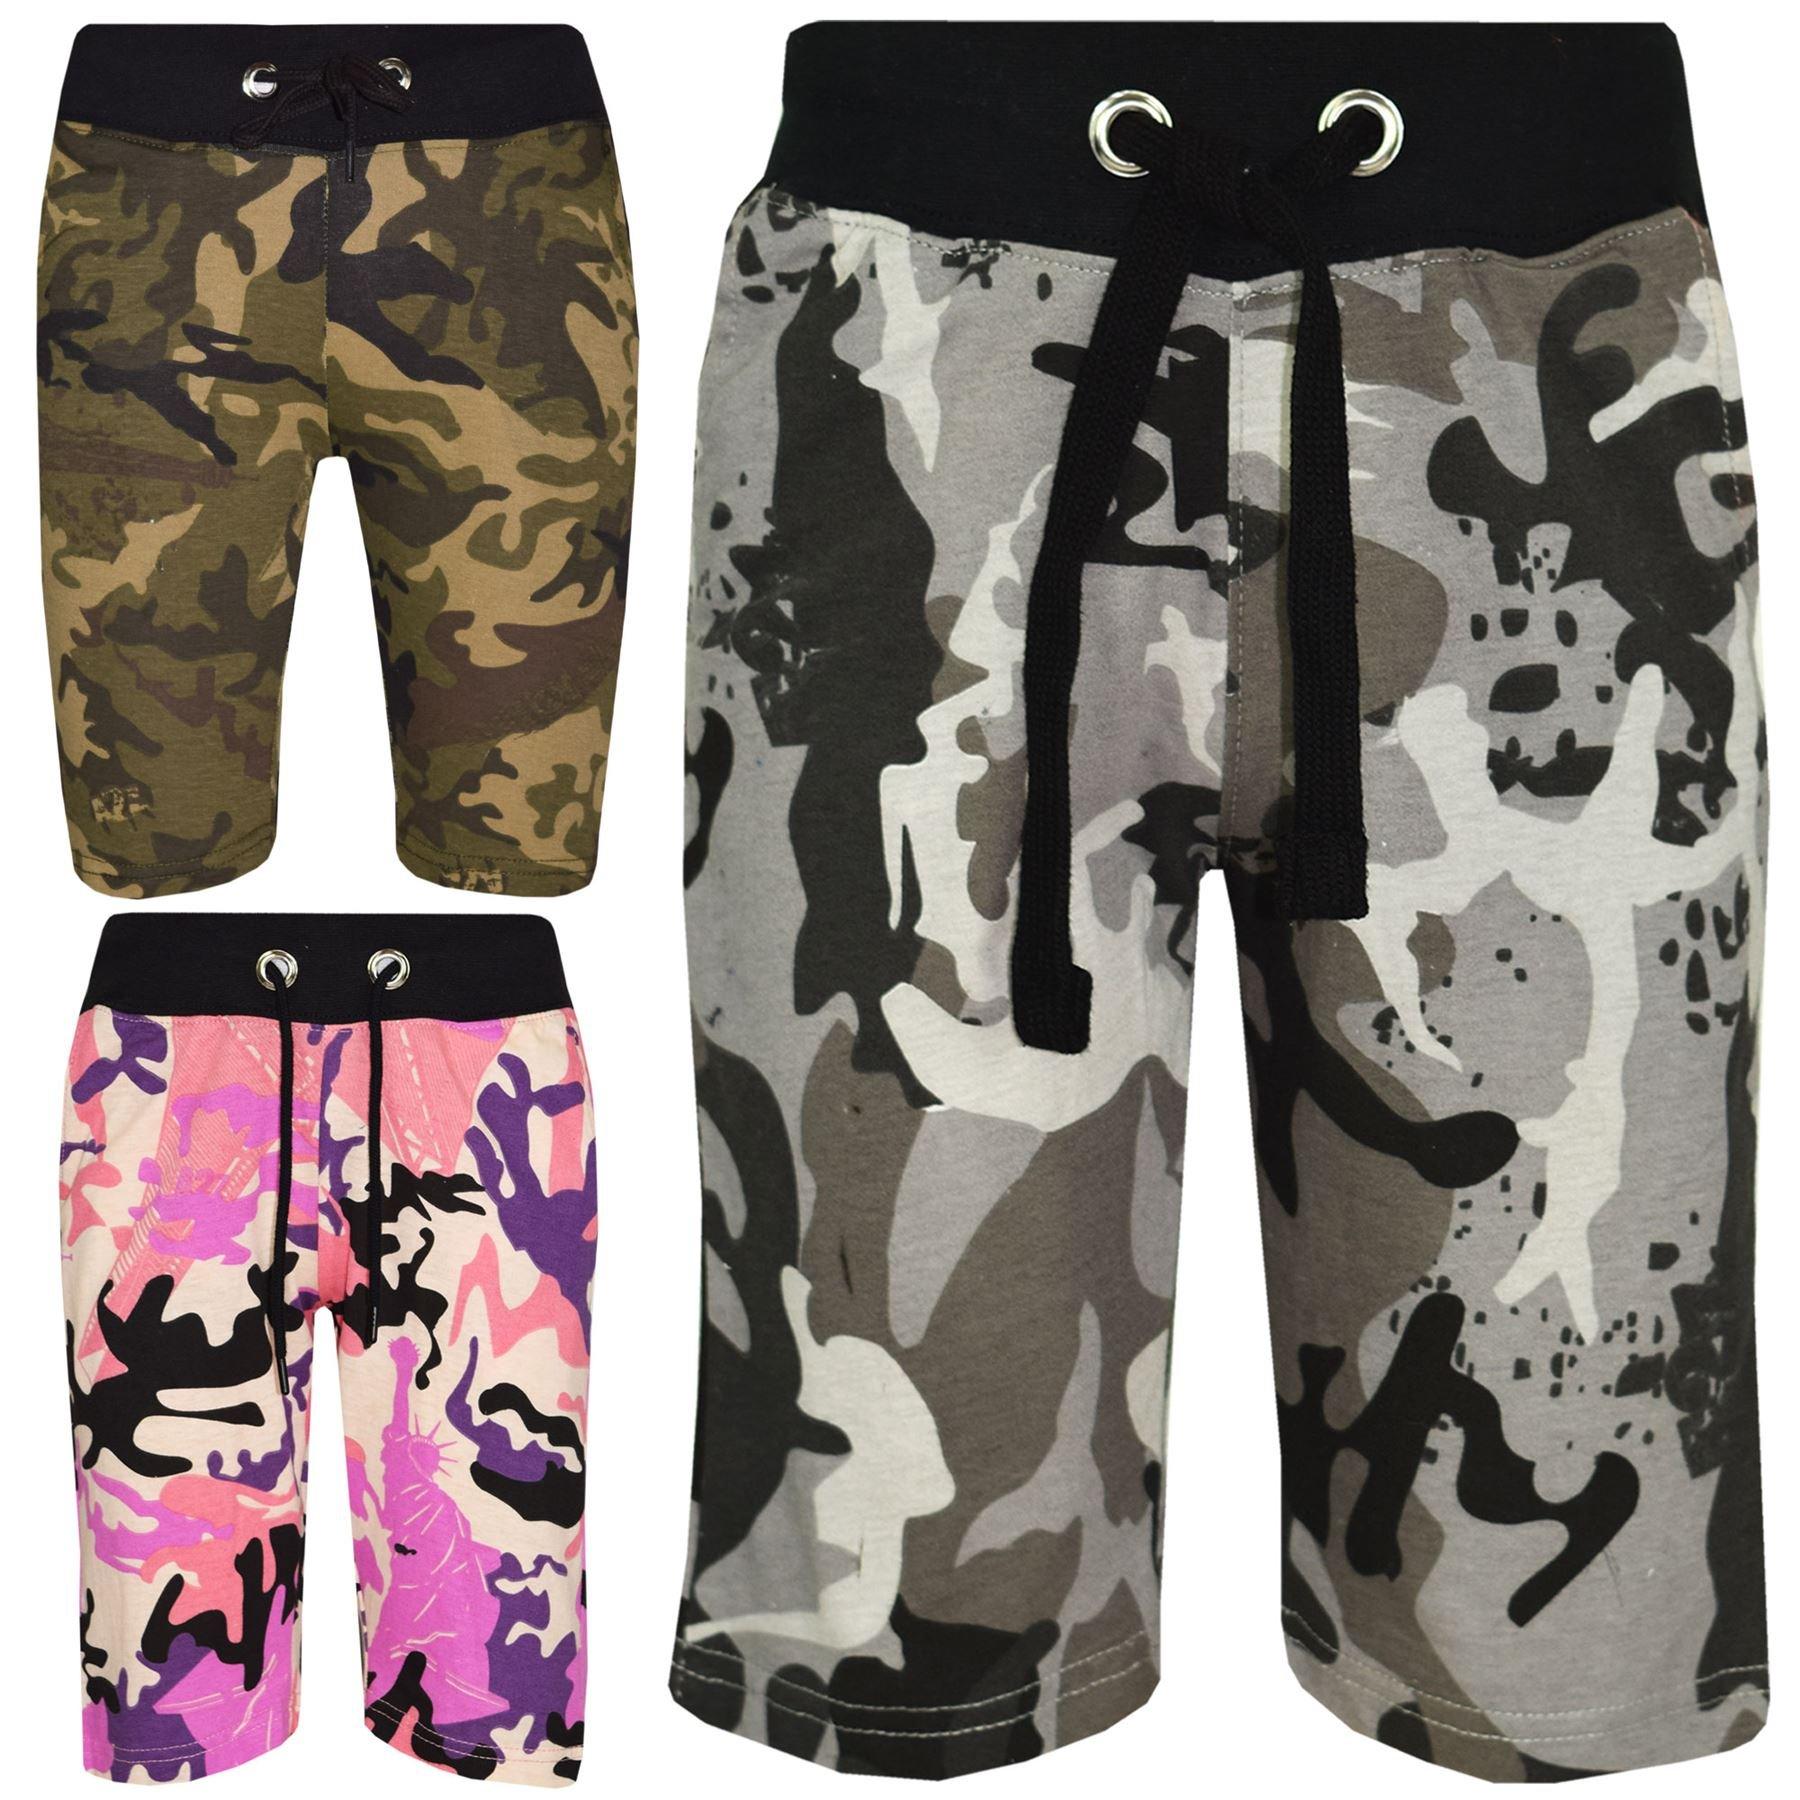 0eba70707 A2Z 4 Kids® Kids Shorts Girls Boys Designer's Camouflage Print ...